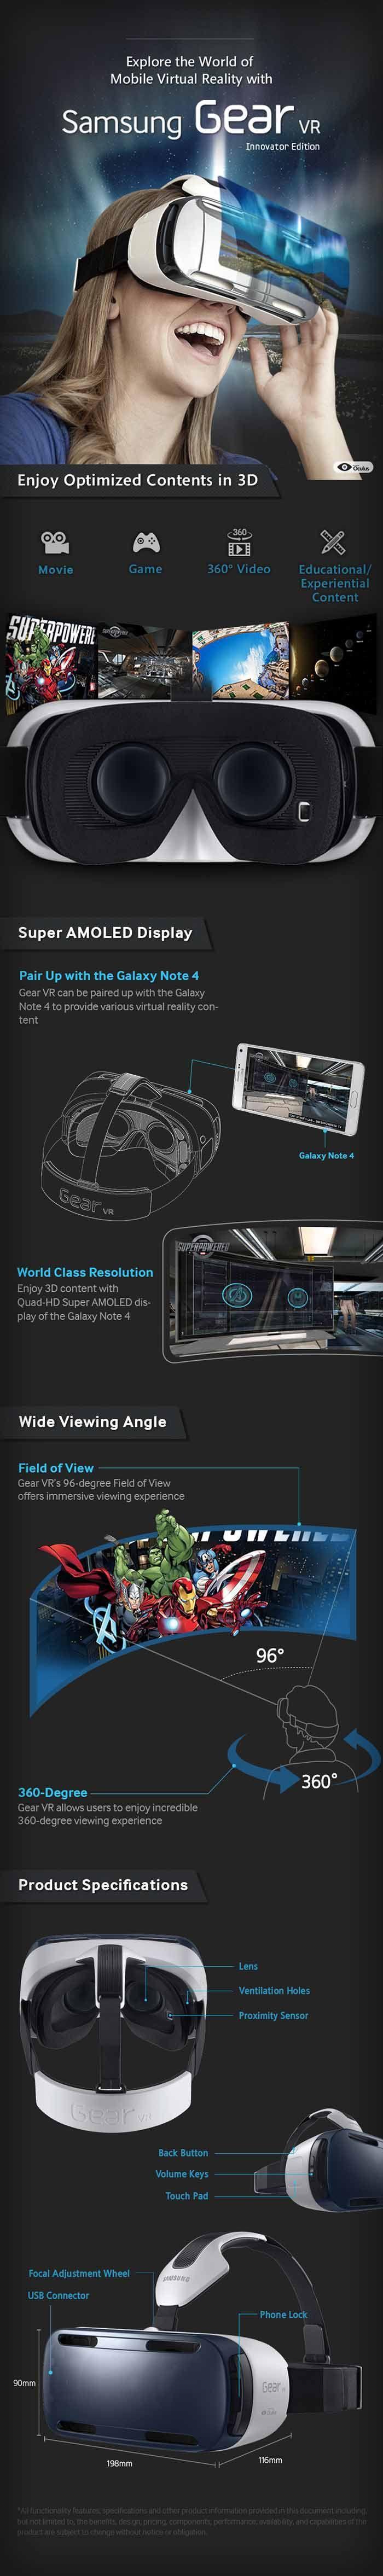 Samsung Galaxy Gear VR (Explore the world of mobile virtual reality) [Virtual…